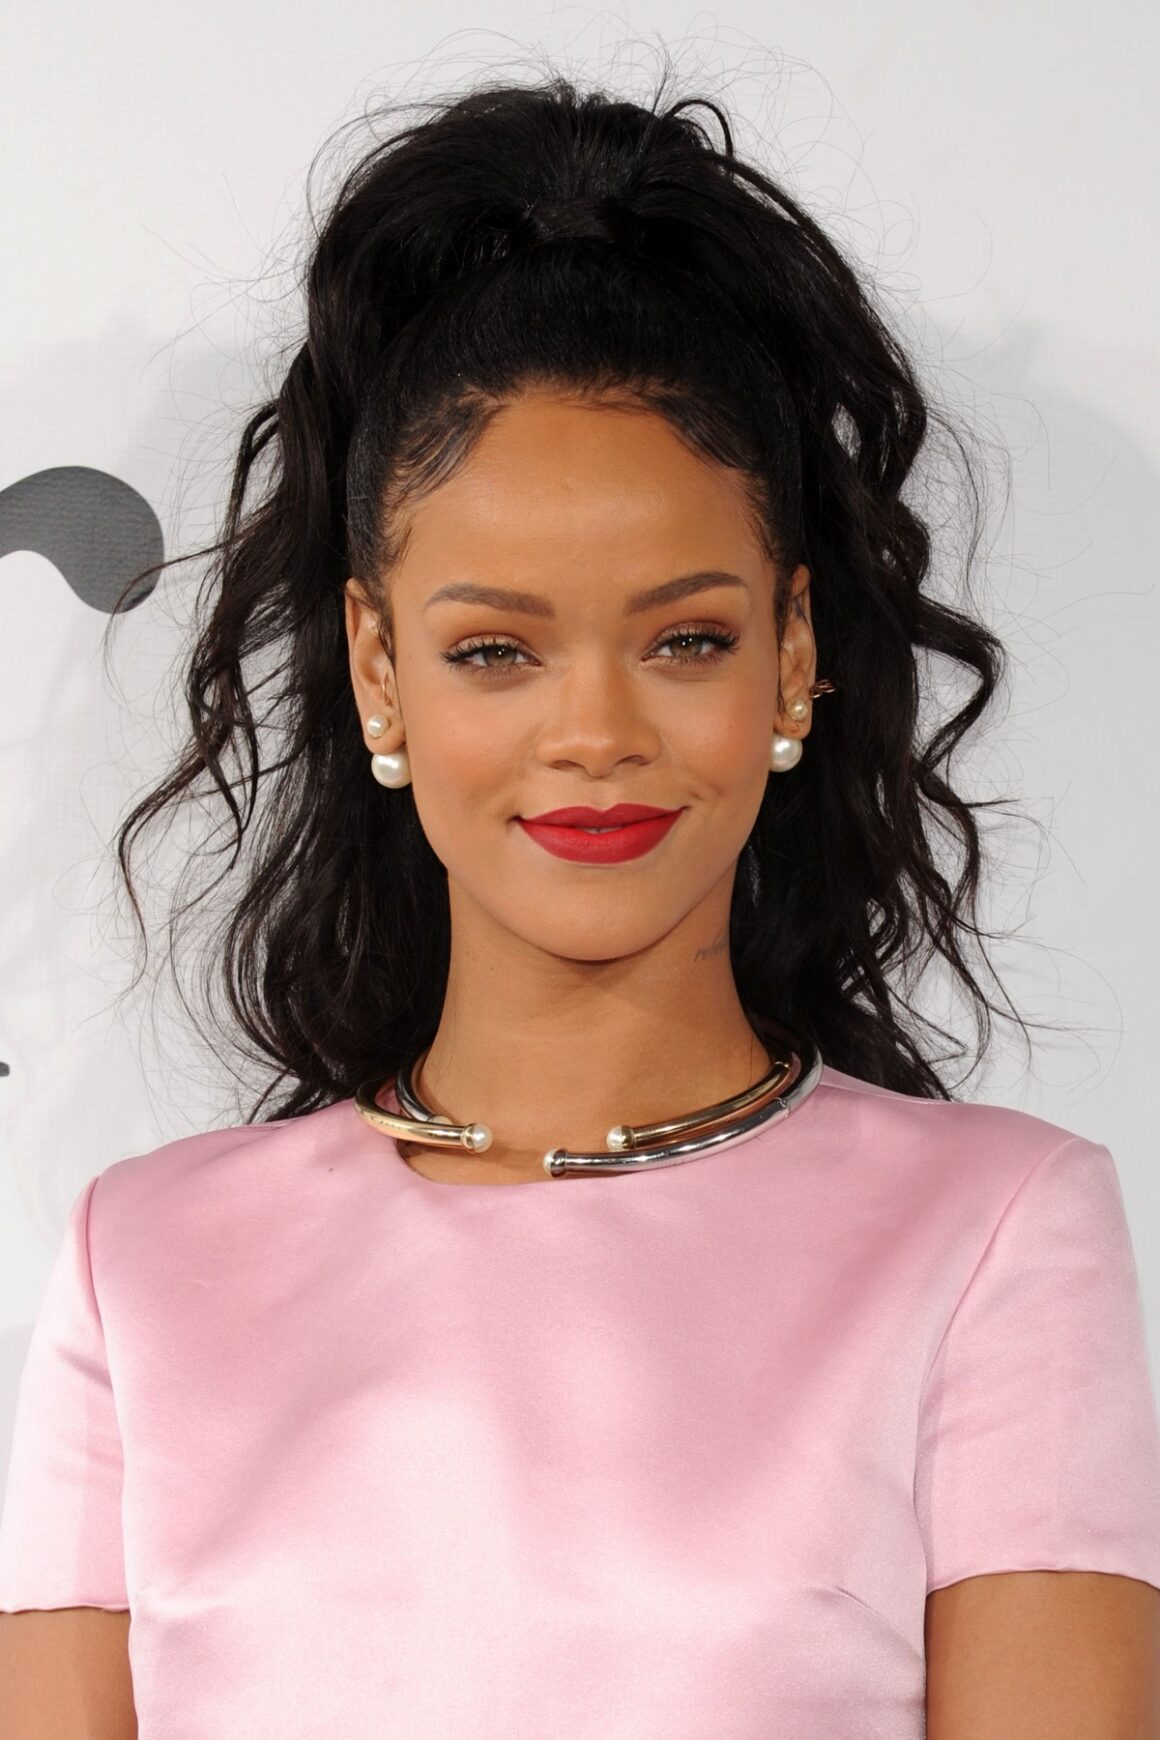 Rihanna Christian Dior Cruise 2015 Show In New York City